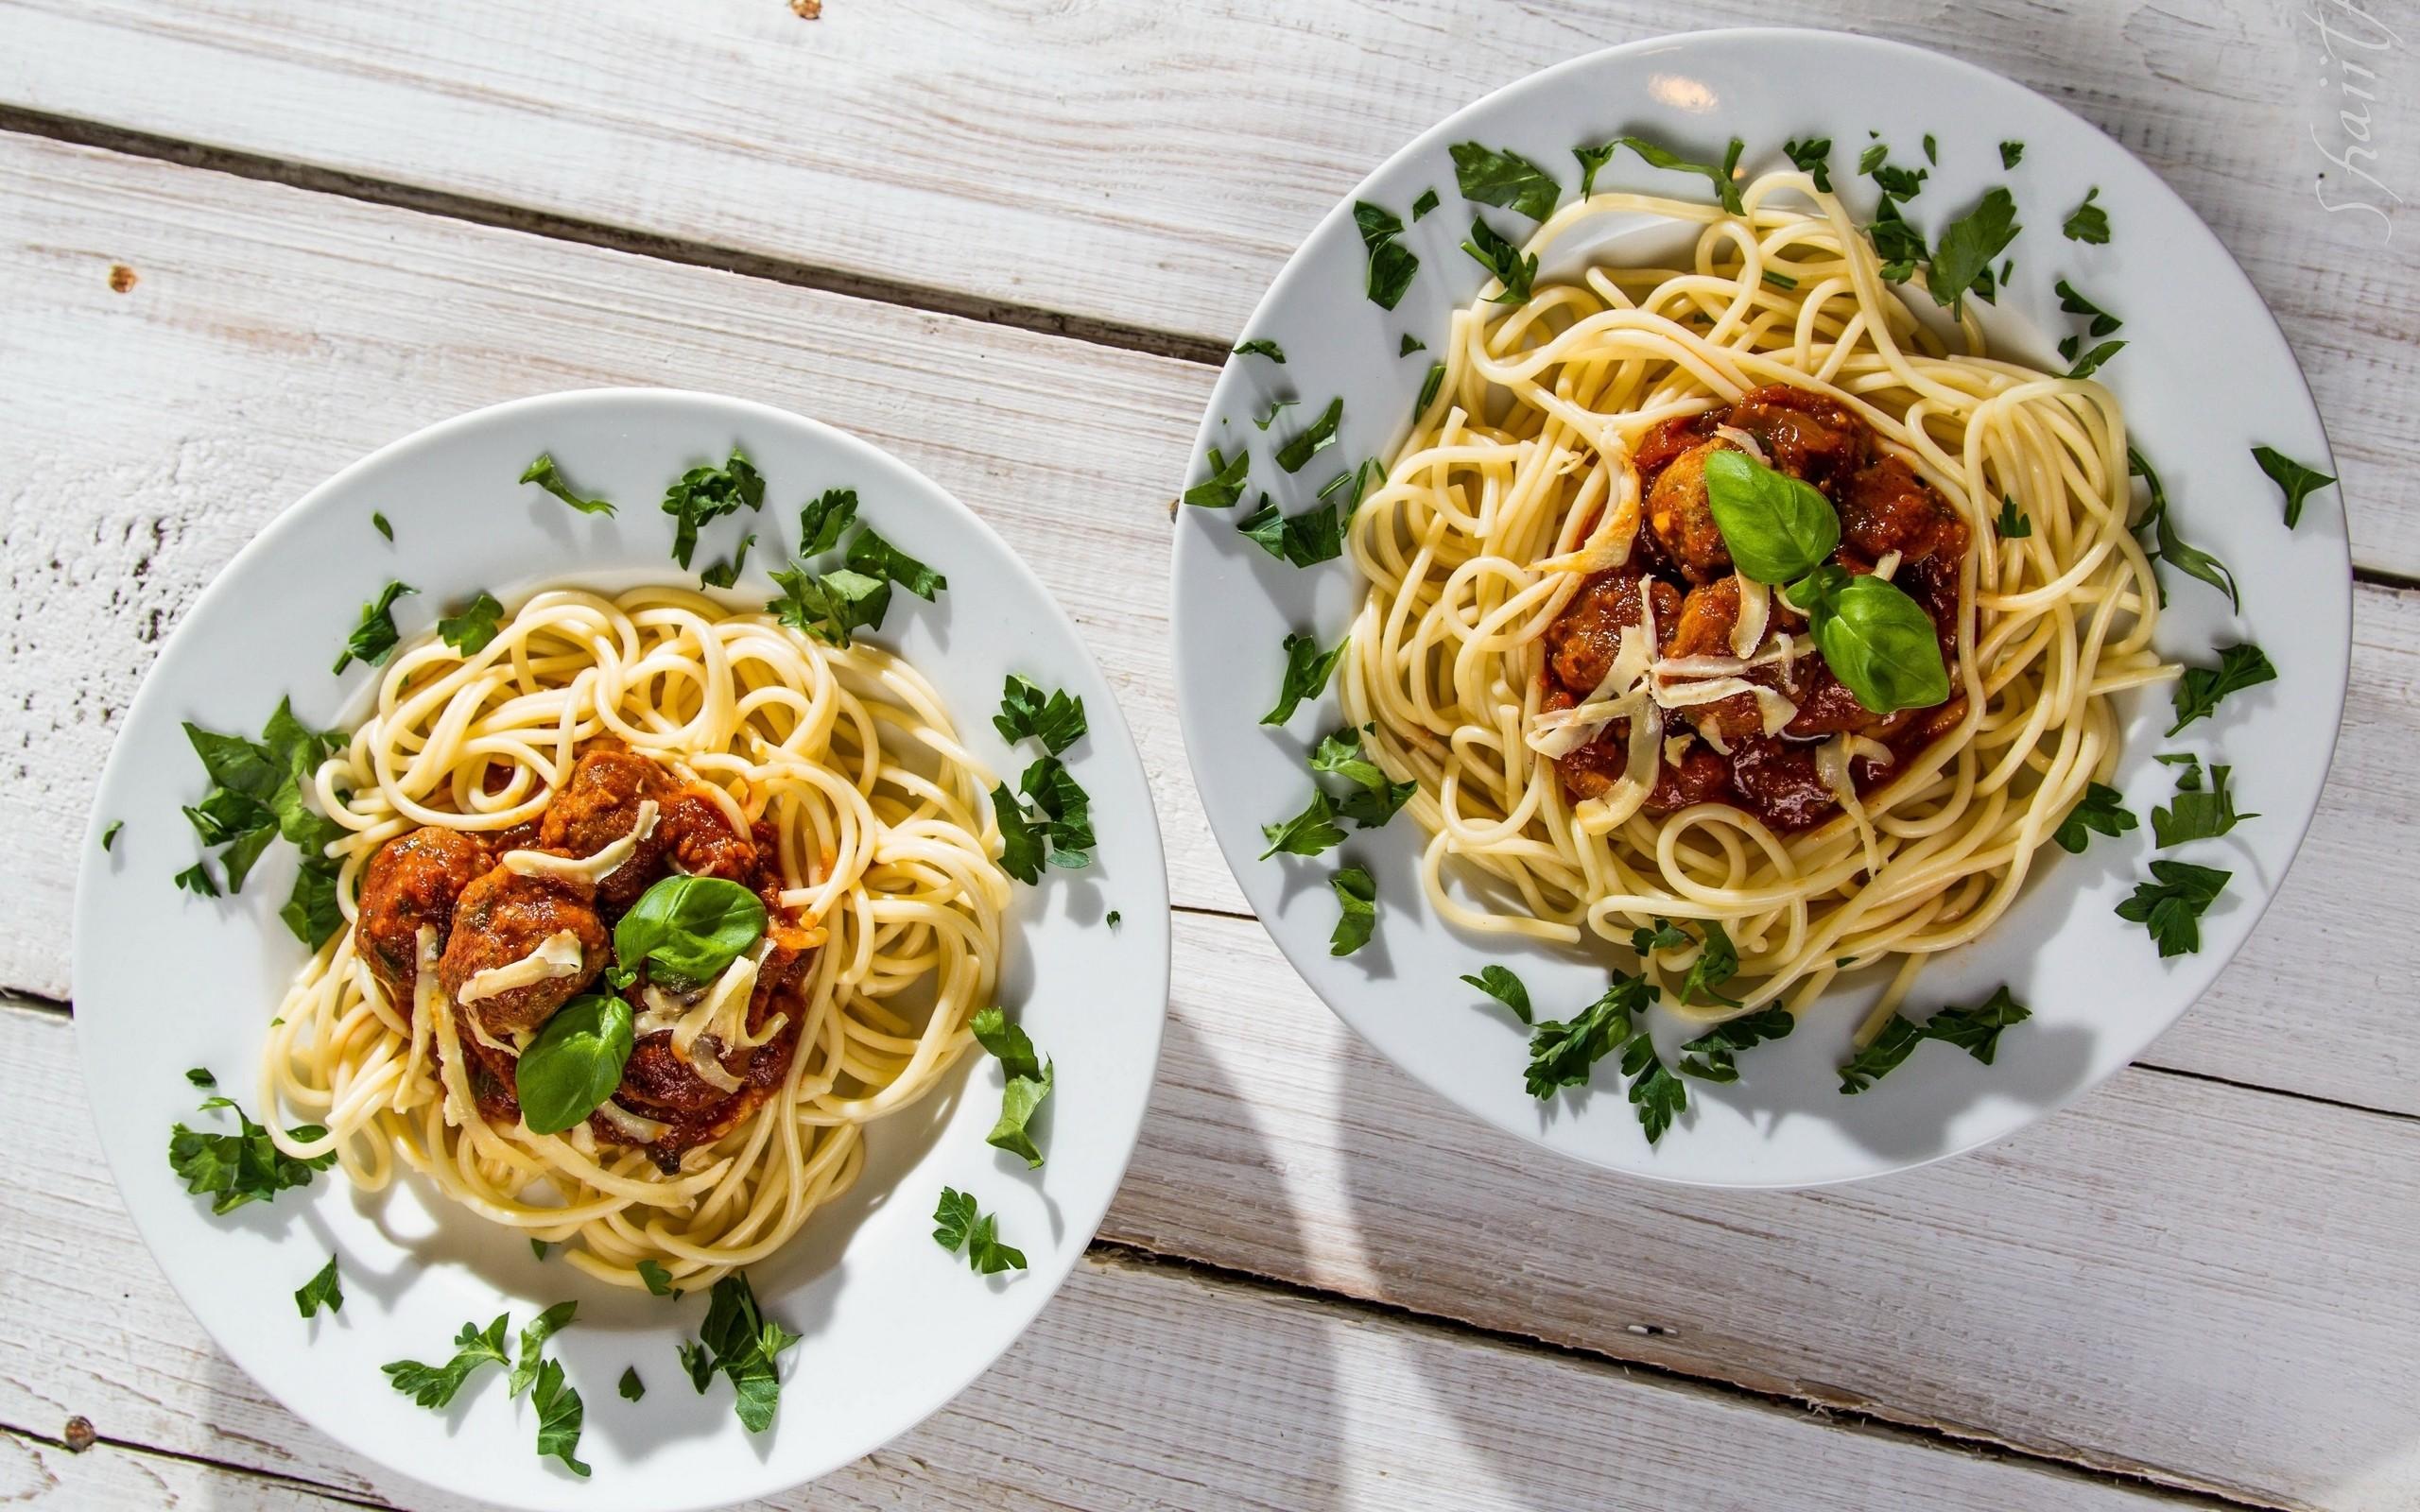 Открытка со спагетти, сестричке открытка